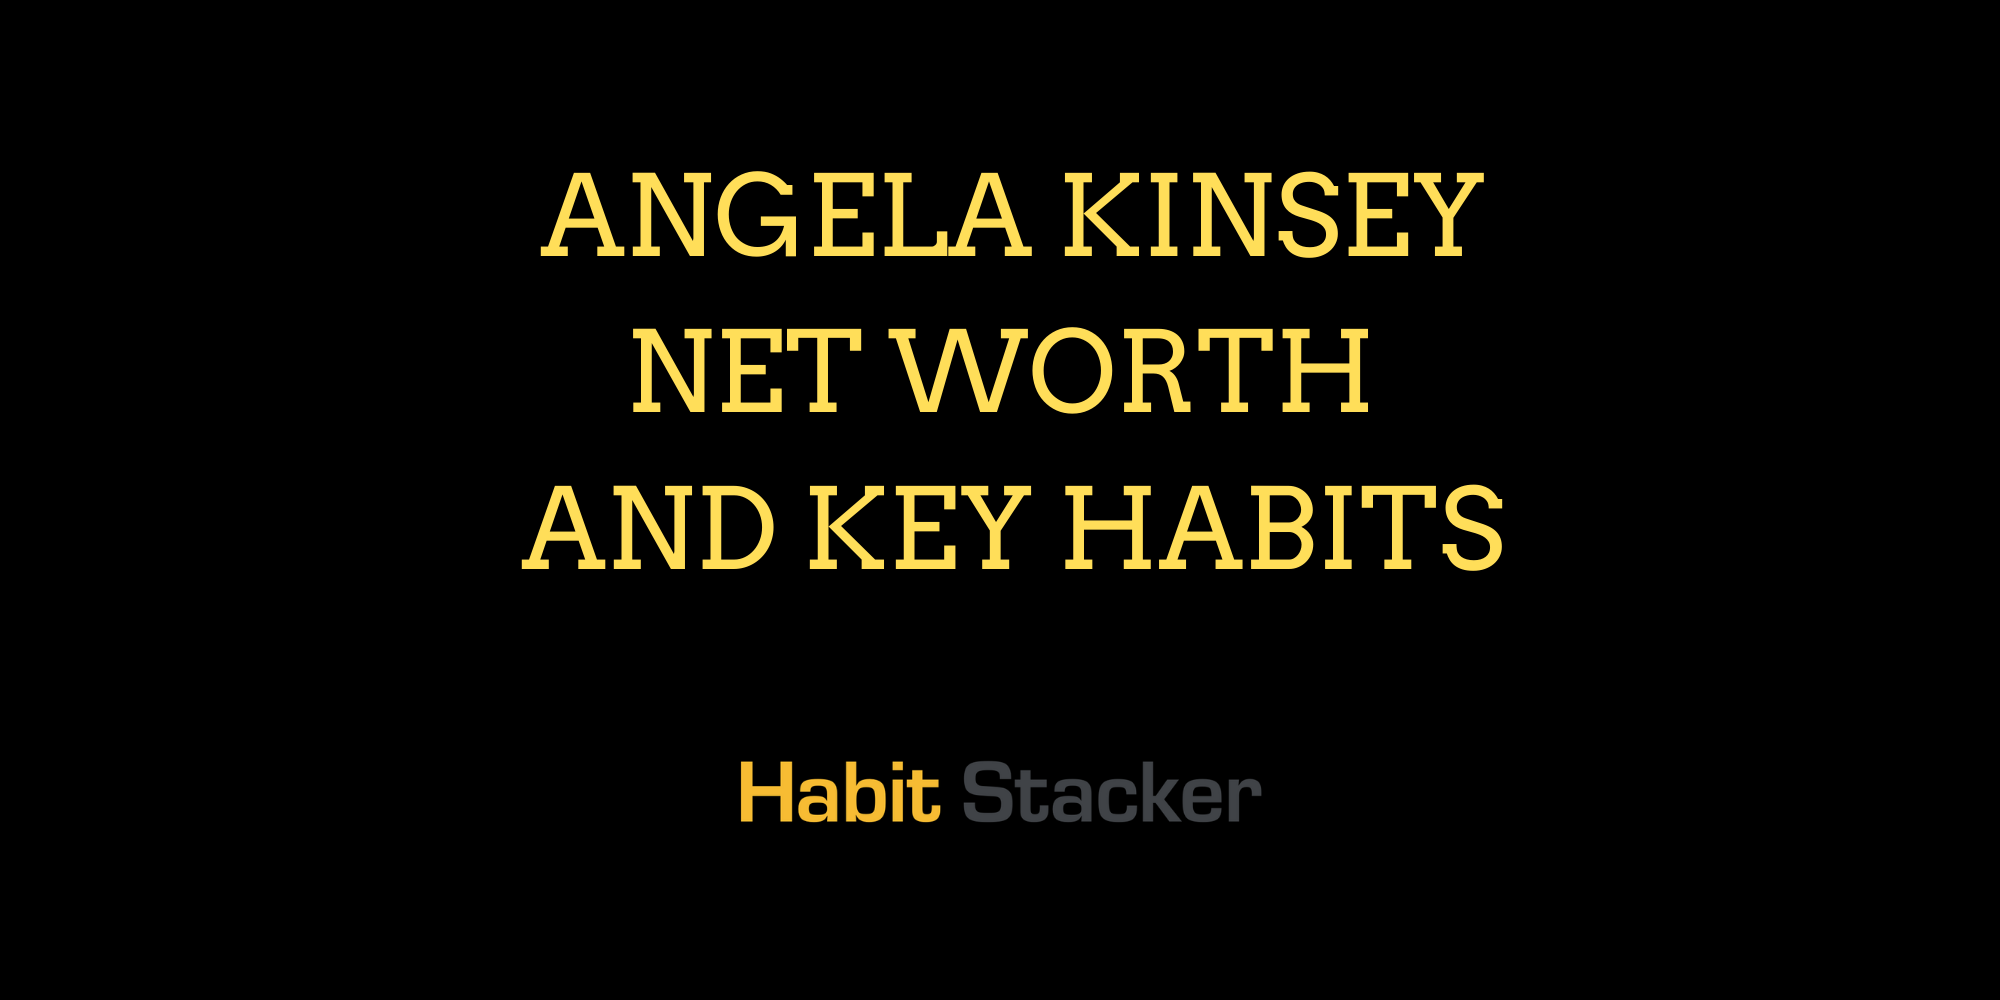 Angela Kinsey Net Worth